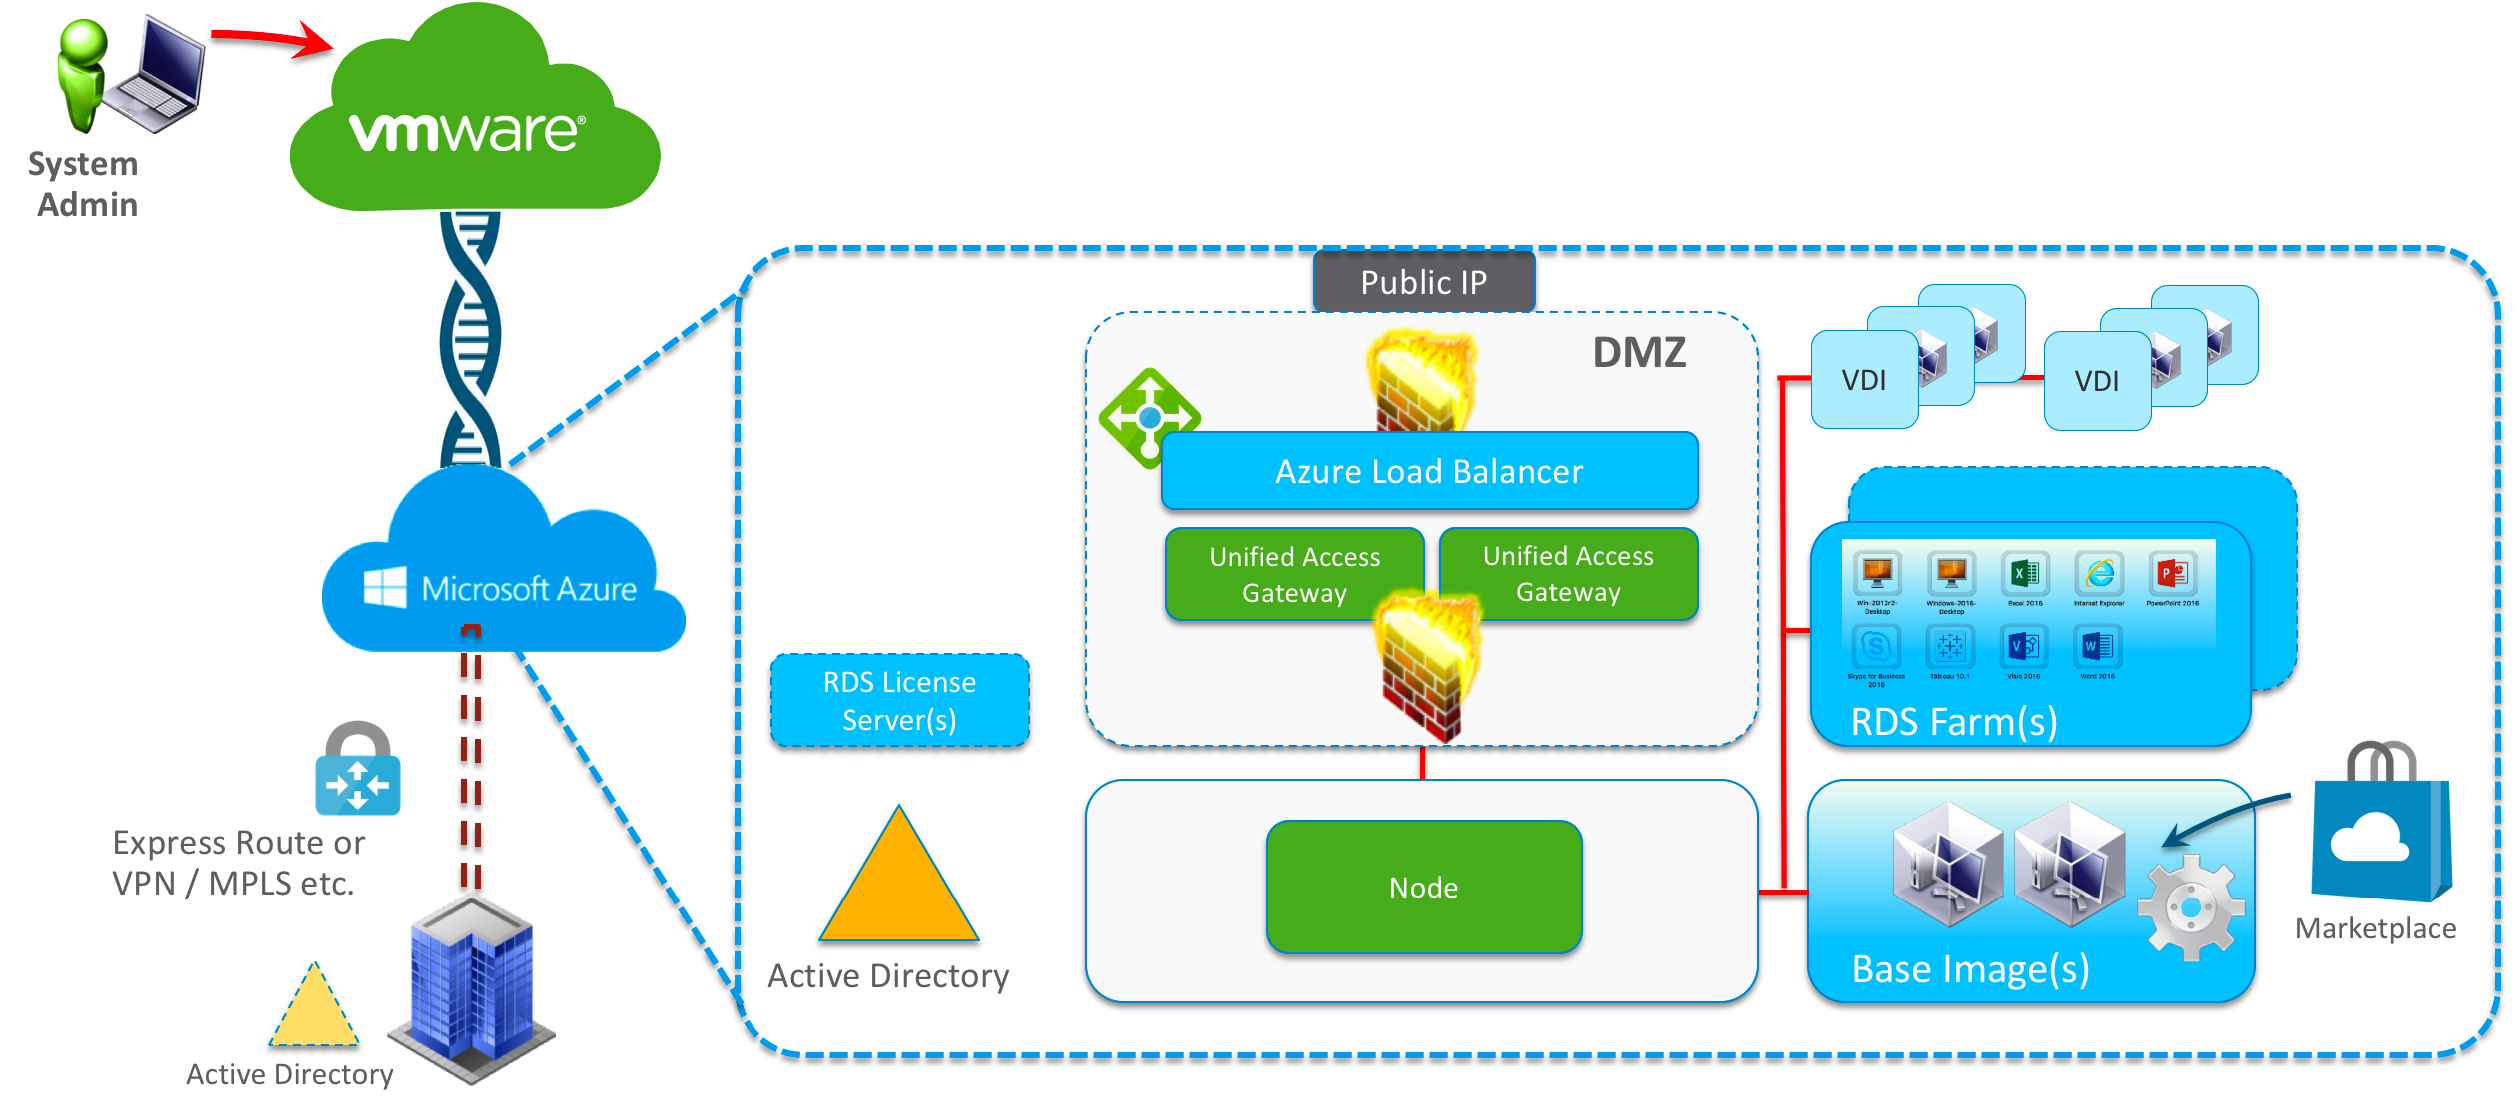 Deploy and Configure Digital Workspaces via VMware Horizon Cloud and